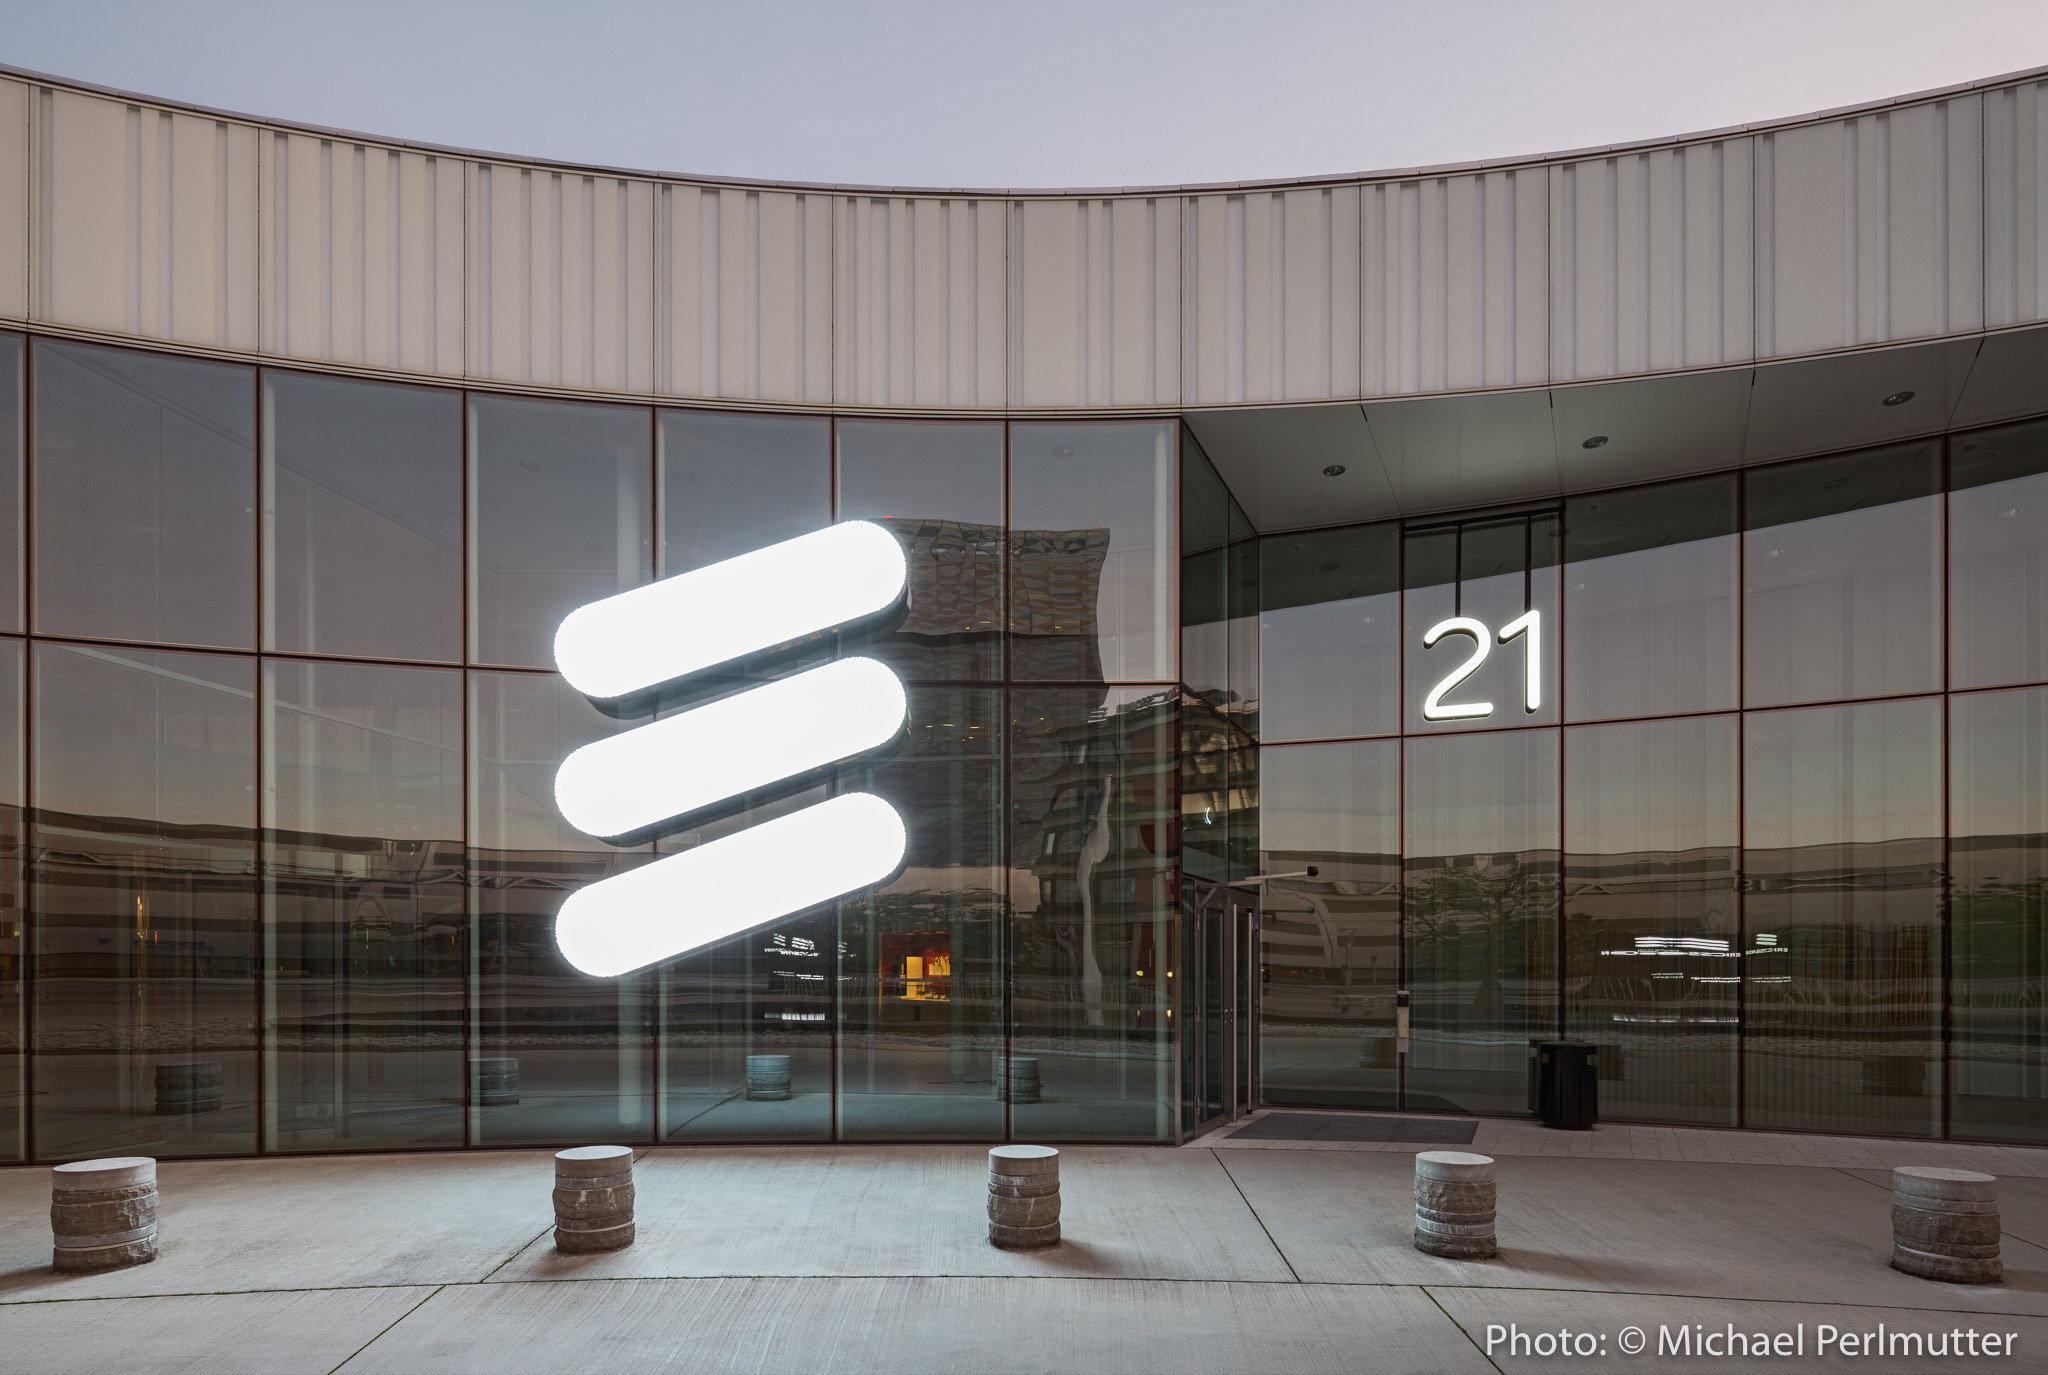 mp_Ericsson_HQ_Signage_31.jpg